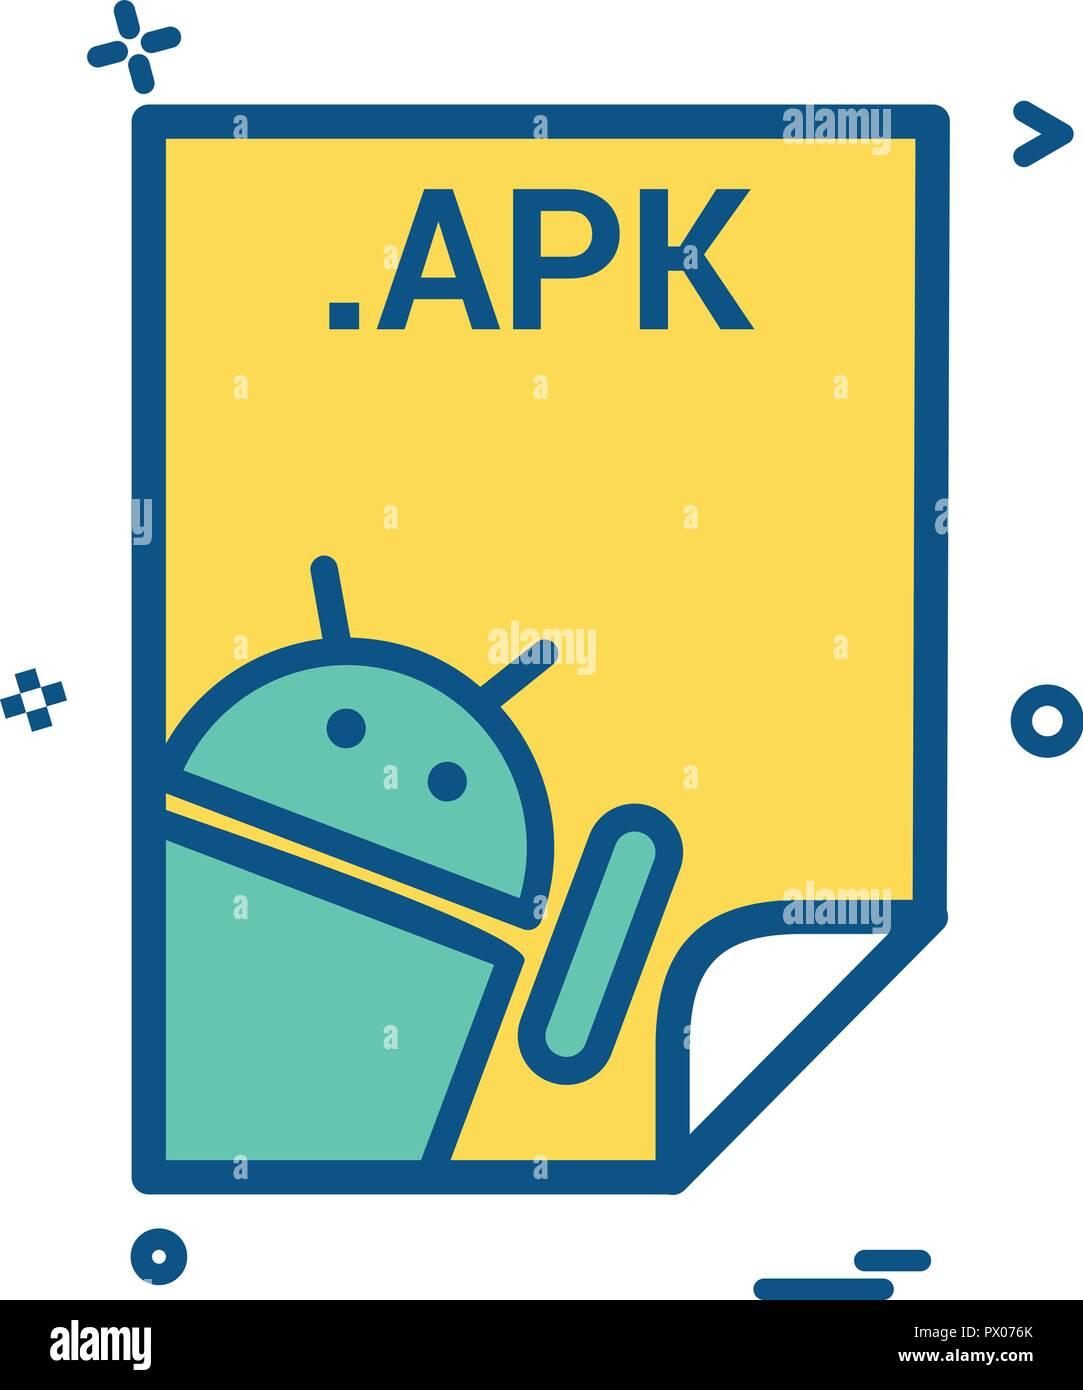 apk application download file files format icon vector design Stock